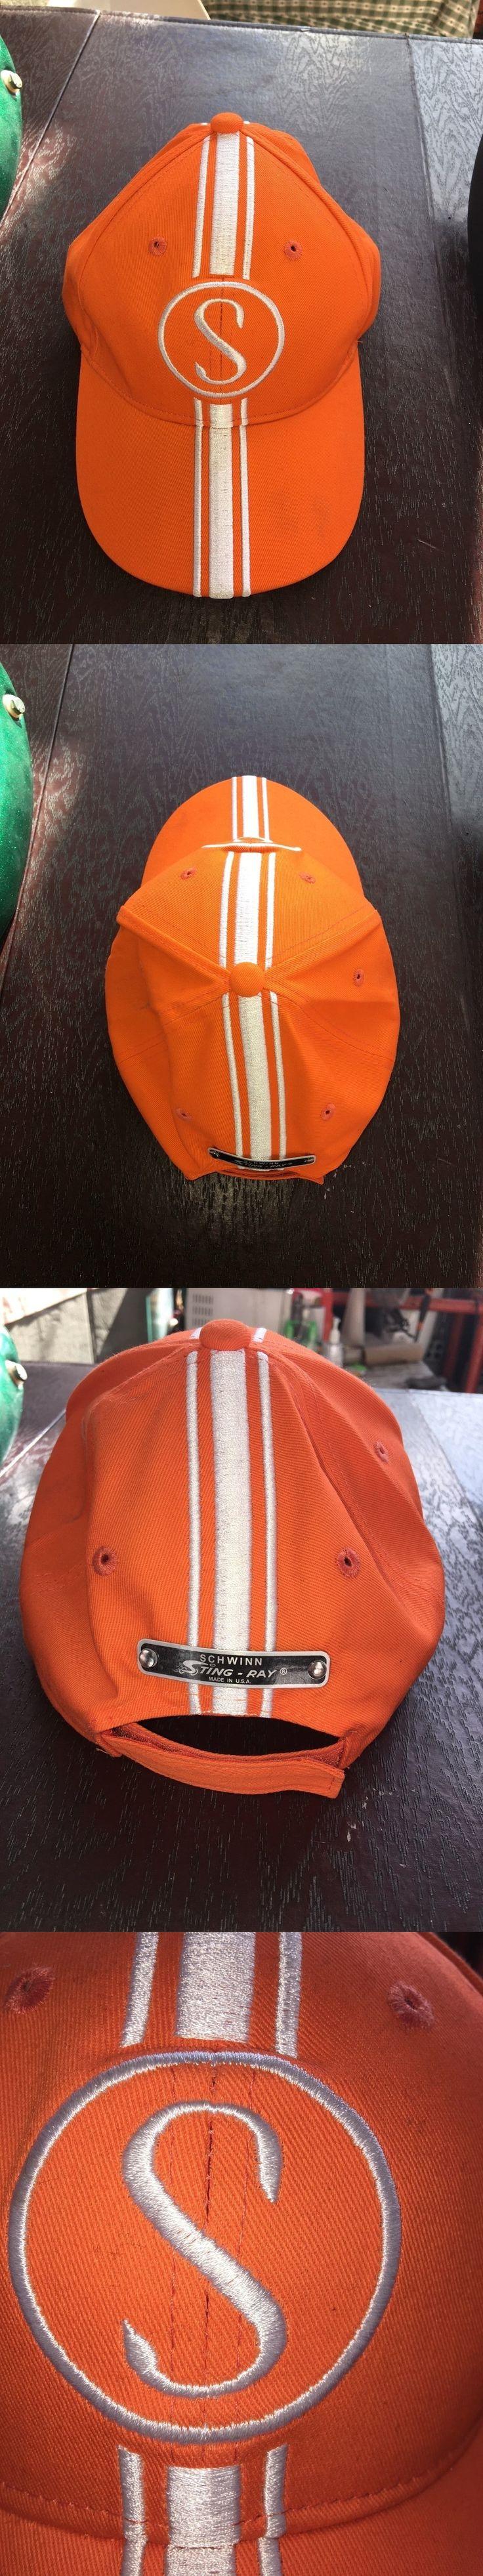 Hats Caps and Headbands 158994: Schwinn Stingray Orange Krate Hat Orange W White Baseball Cap -> BUY IT NOW ONLY: $36.75 on eBay!